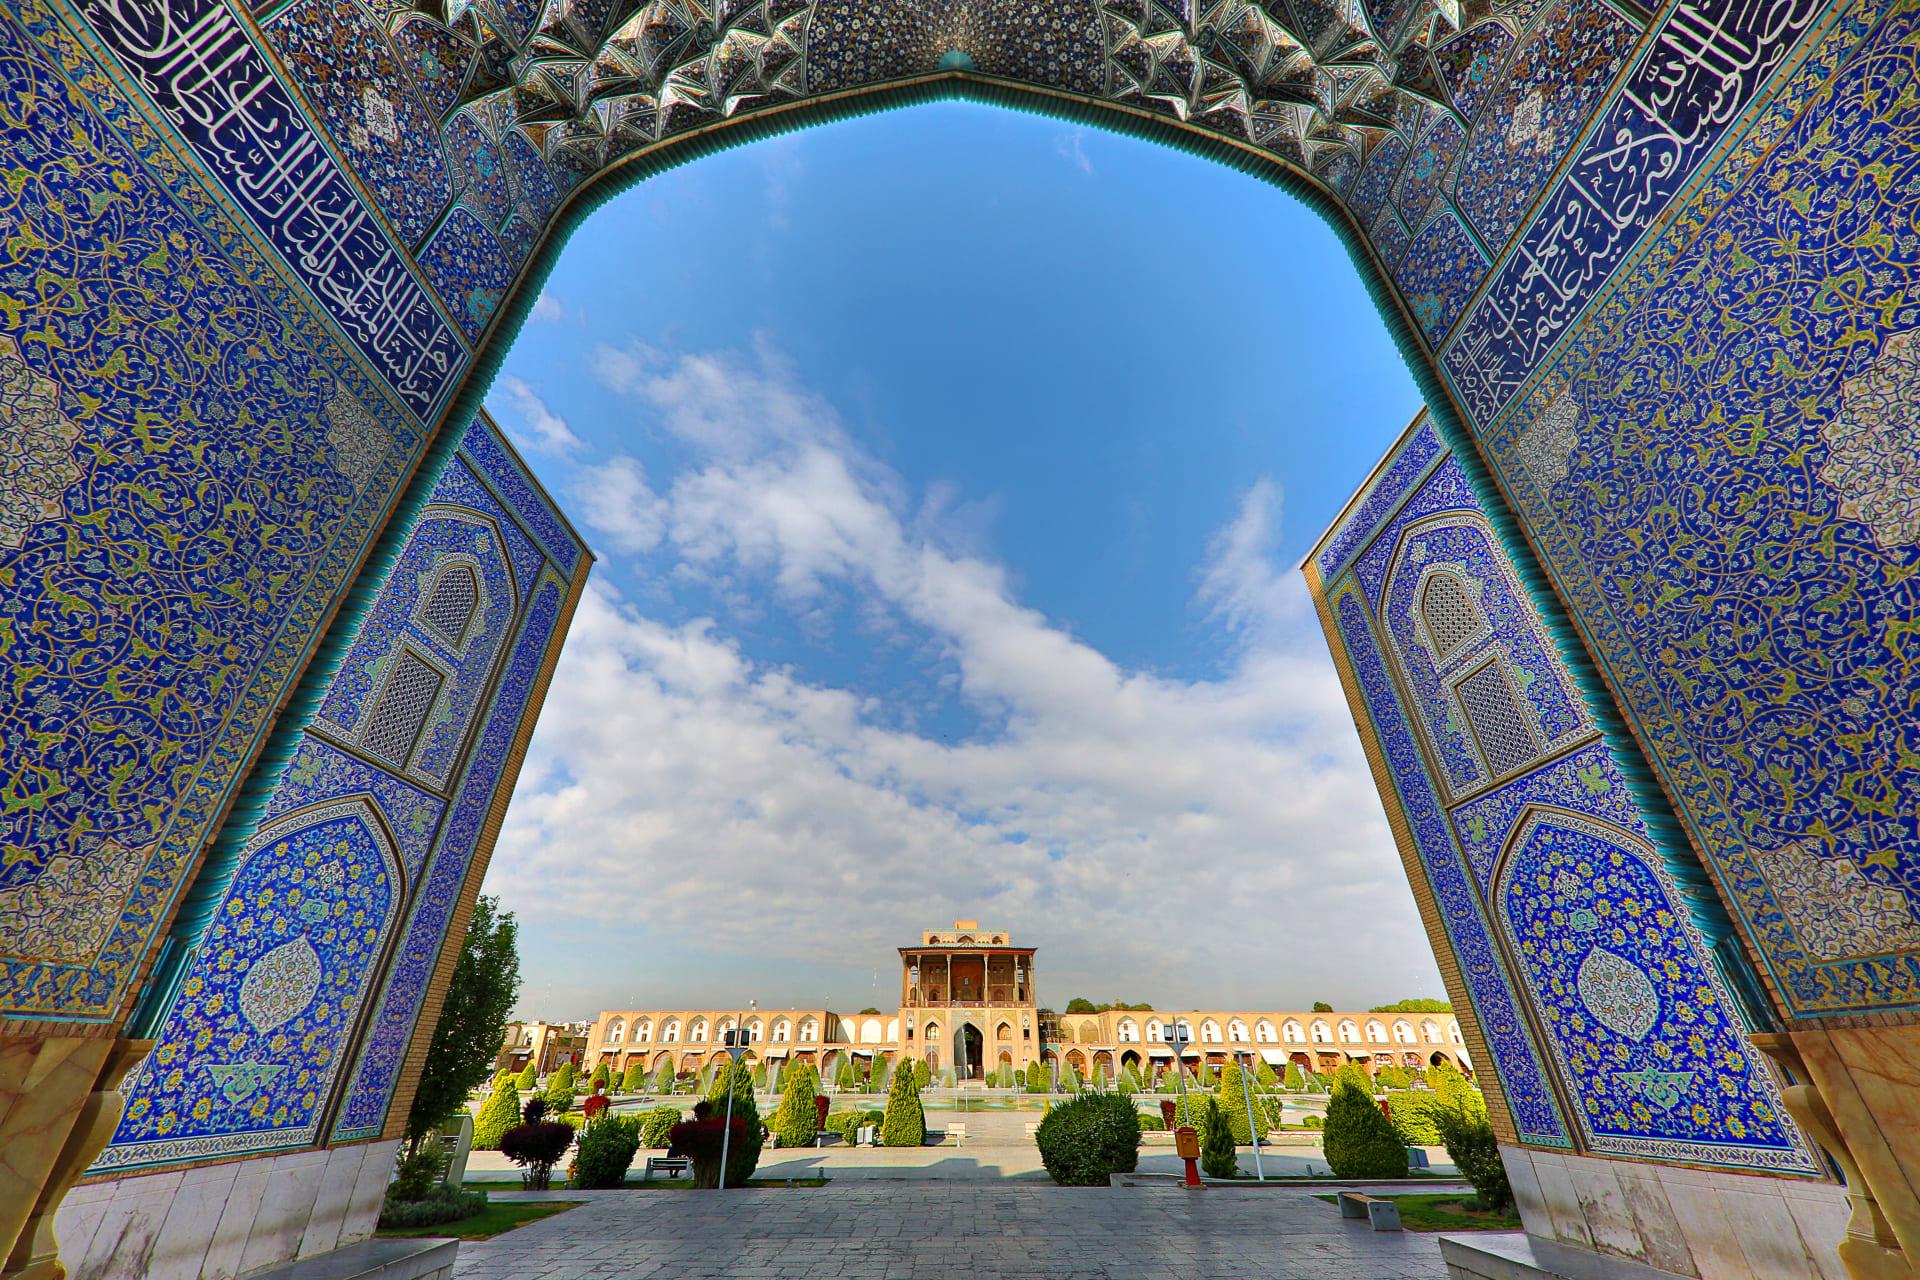 Ispahan - Isfahan Royal Square: UNESCO World Heritage  Site